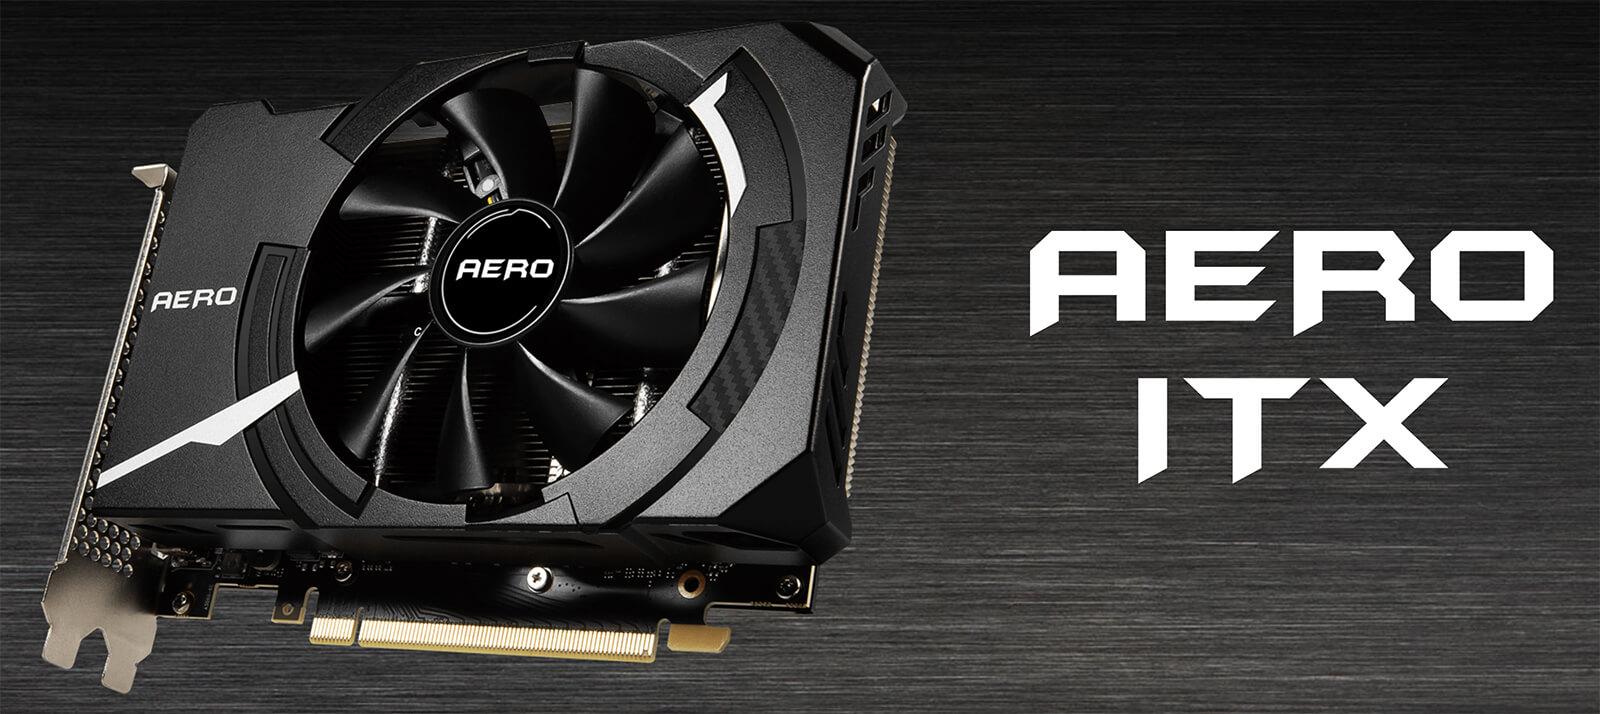 Msi Geforce Rtx™ 3060 Aero Itx 12g Oc Features